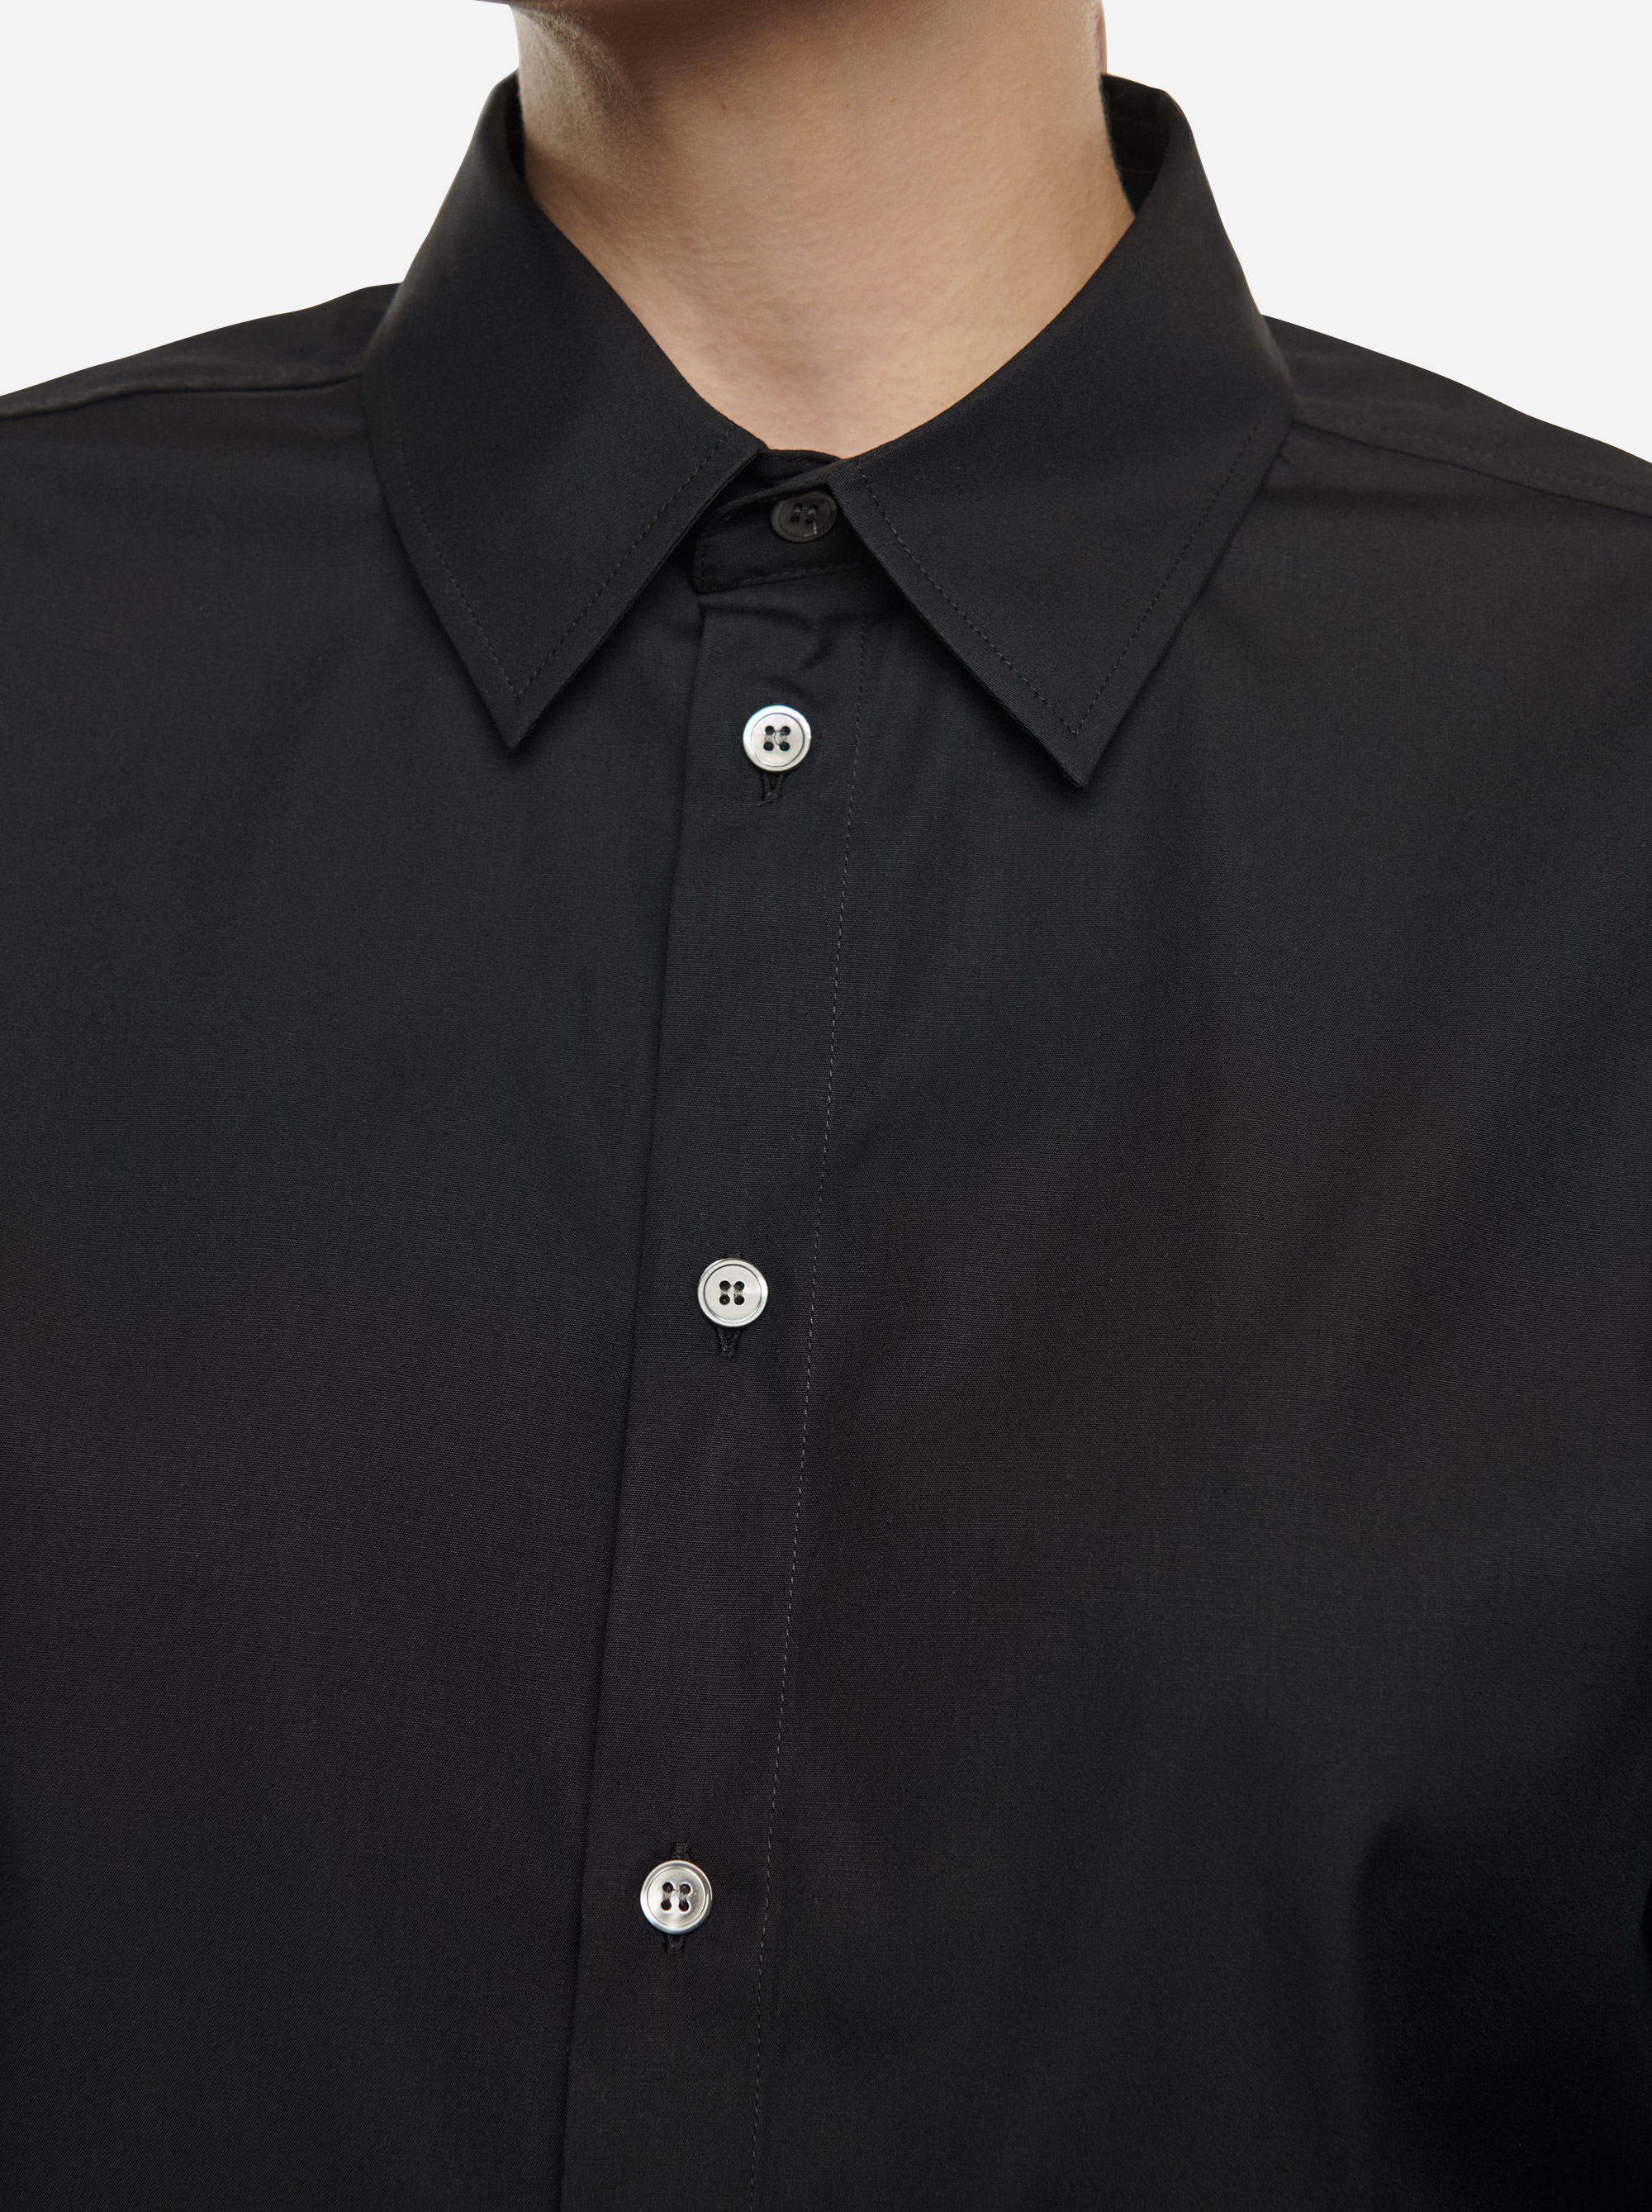 Teym-Shirt-Black-women-mens2